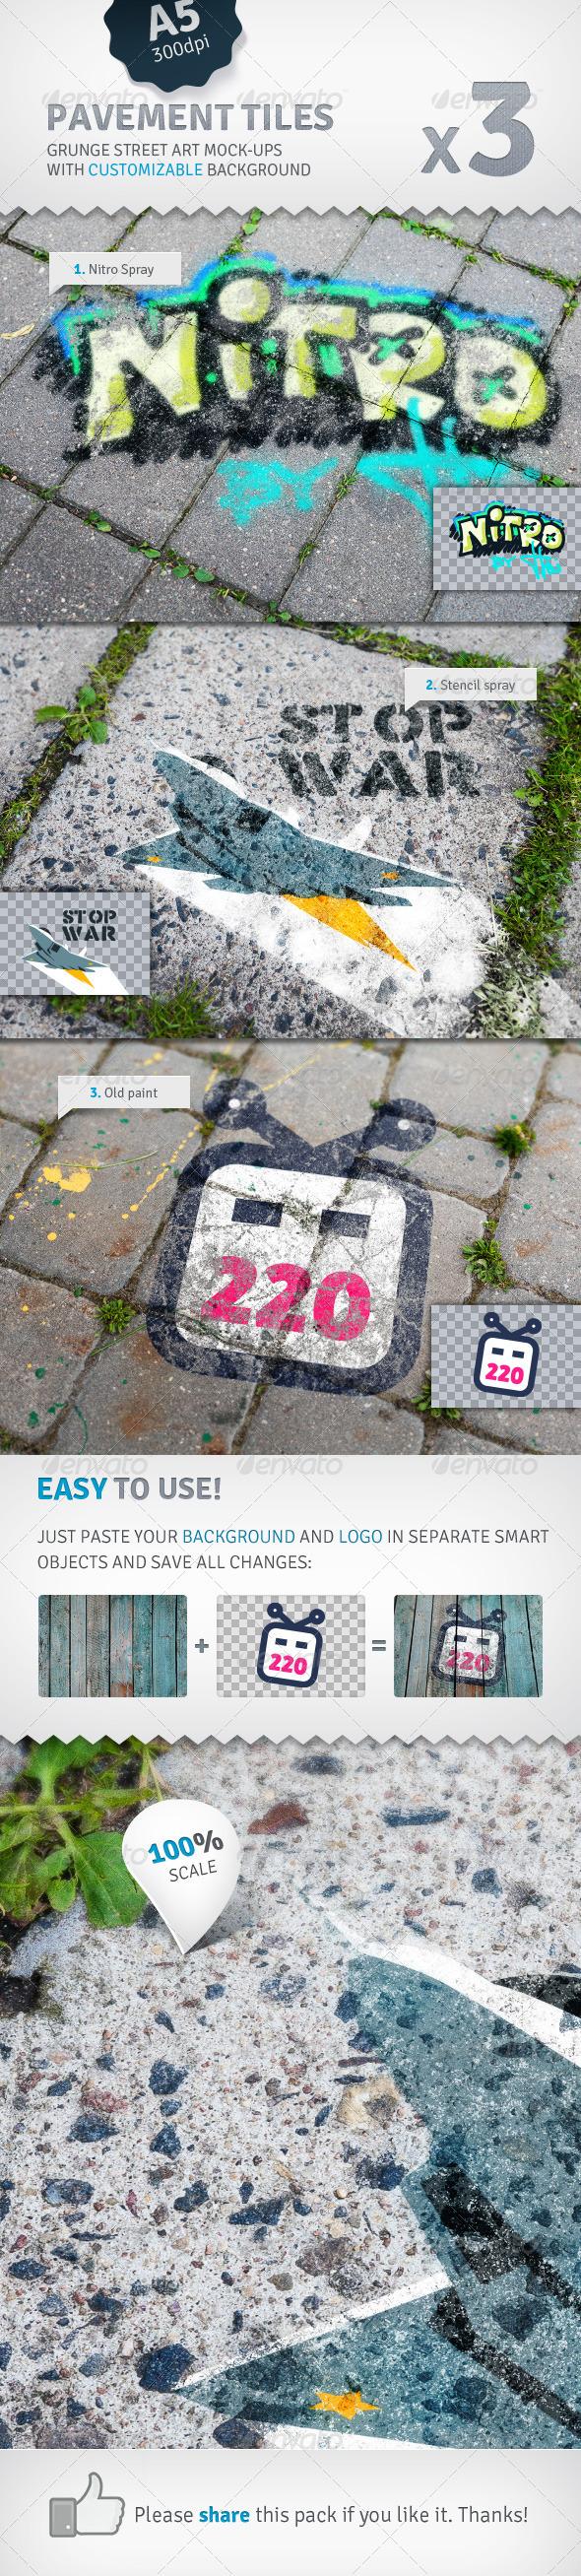 GraphicRiver Pavement Tiles 3 Graffiti Street Art Mockups 2517210